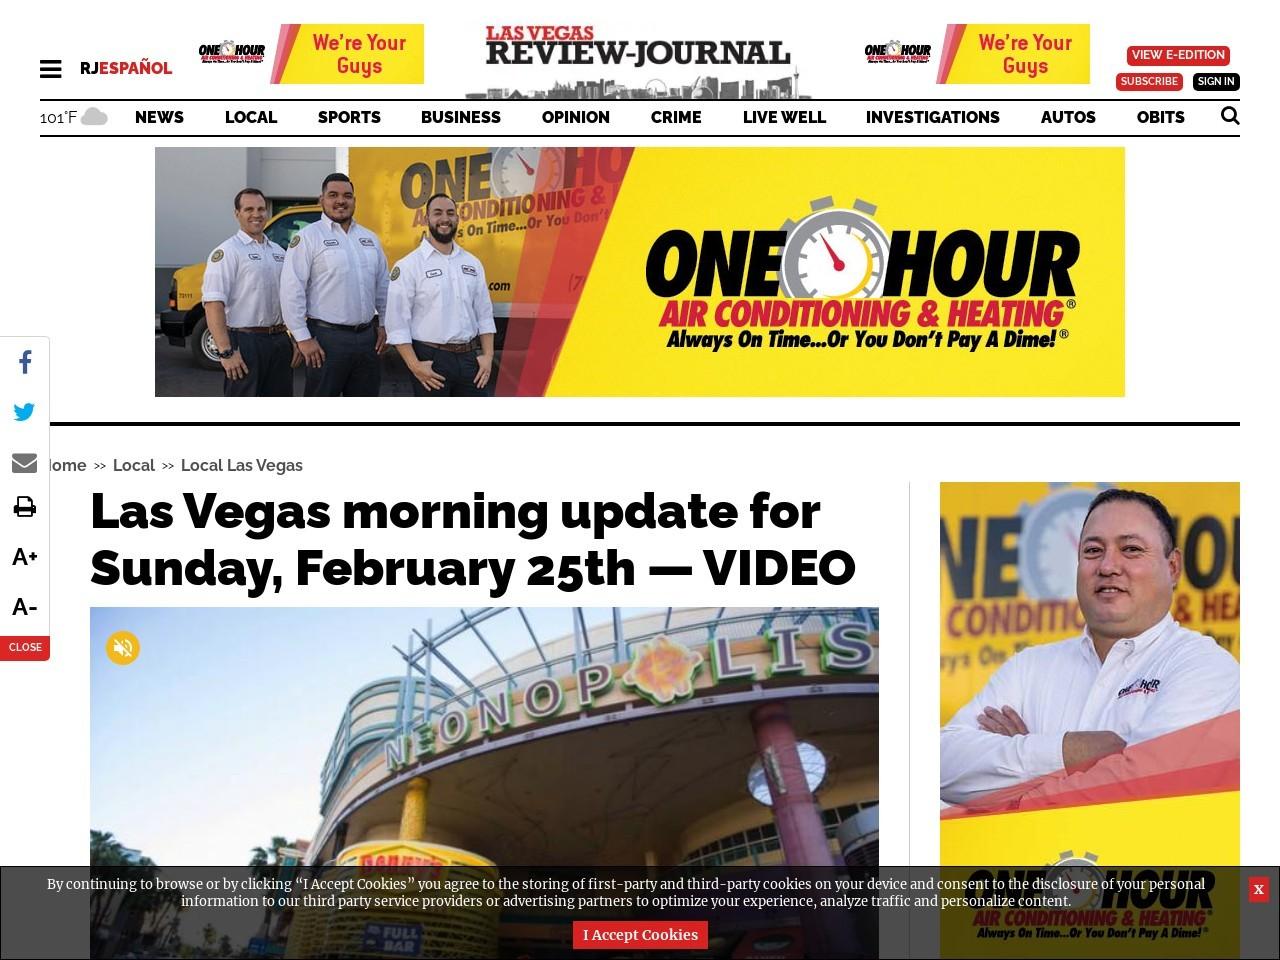 Las Vegas morning update for Sunday, February 25th — VIDEO